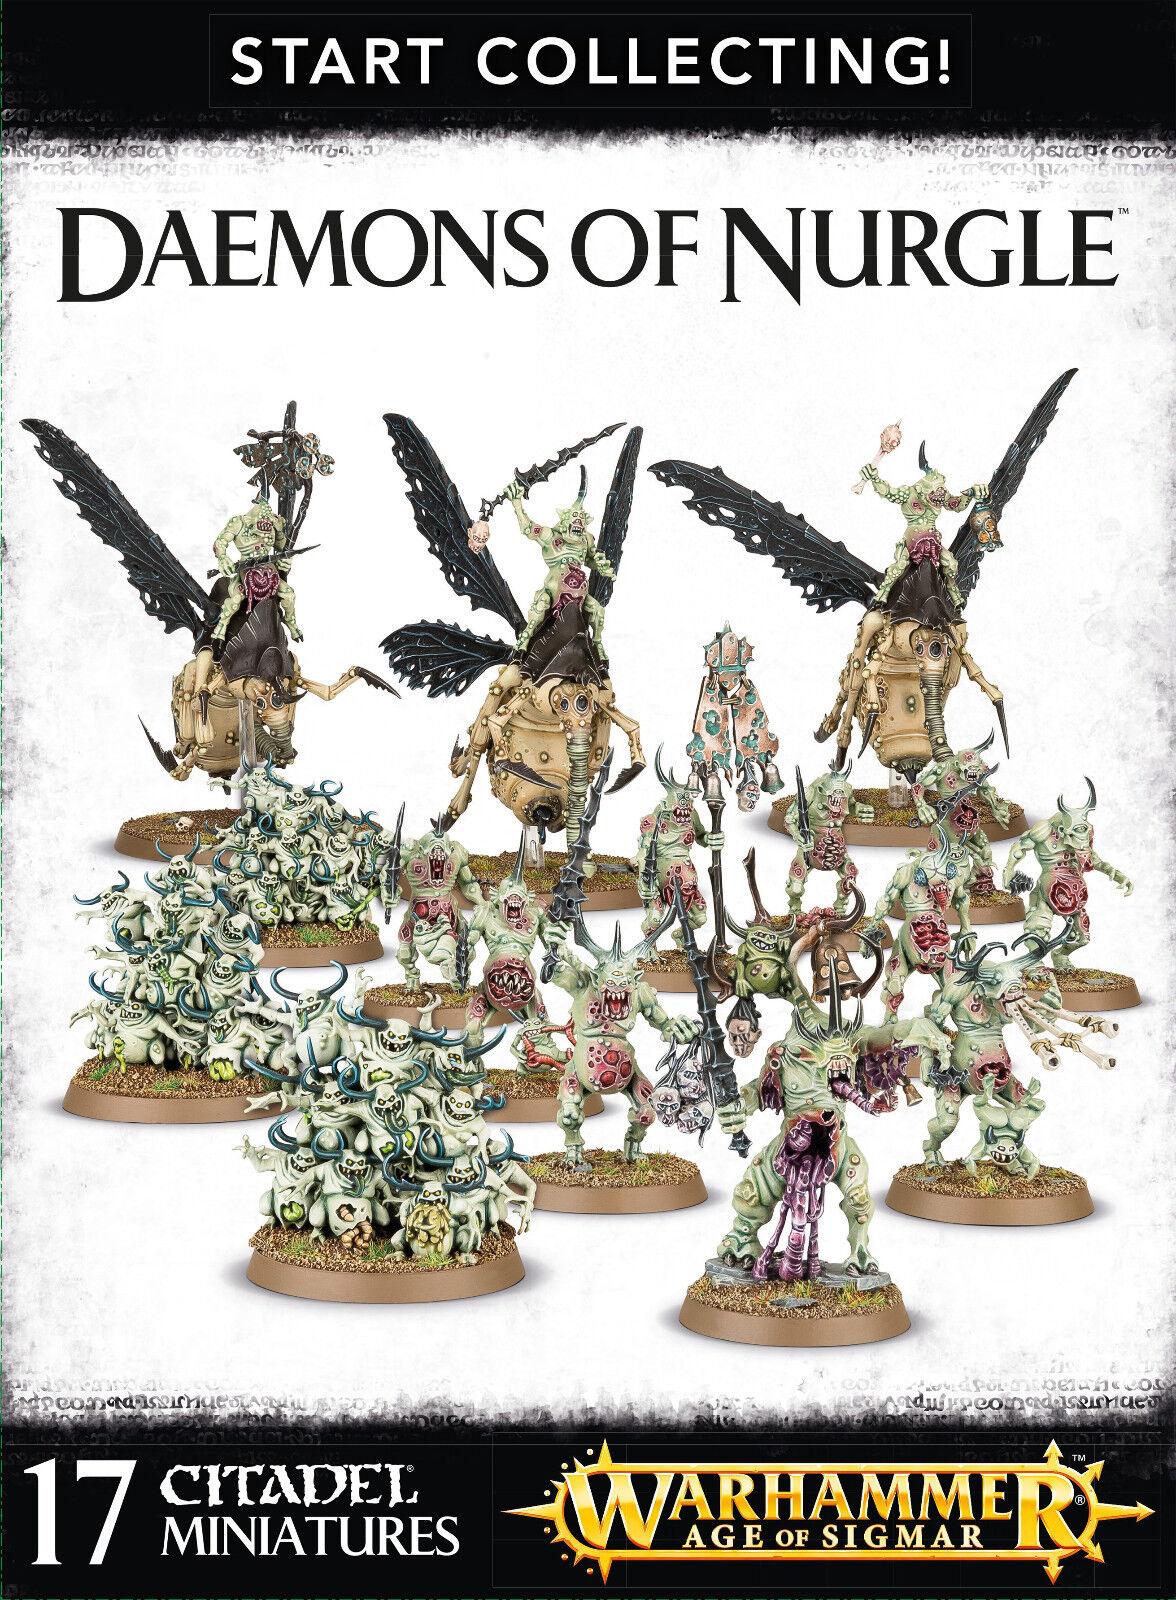 Estrellat Collecting Daemons of  Nurgle Warhammer 40k Age of Sigmar nuovo  consegna rapida